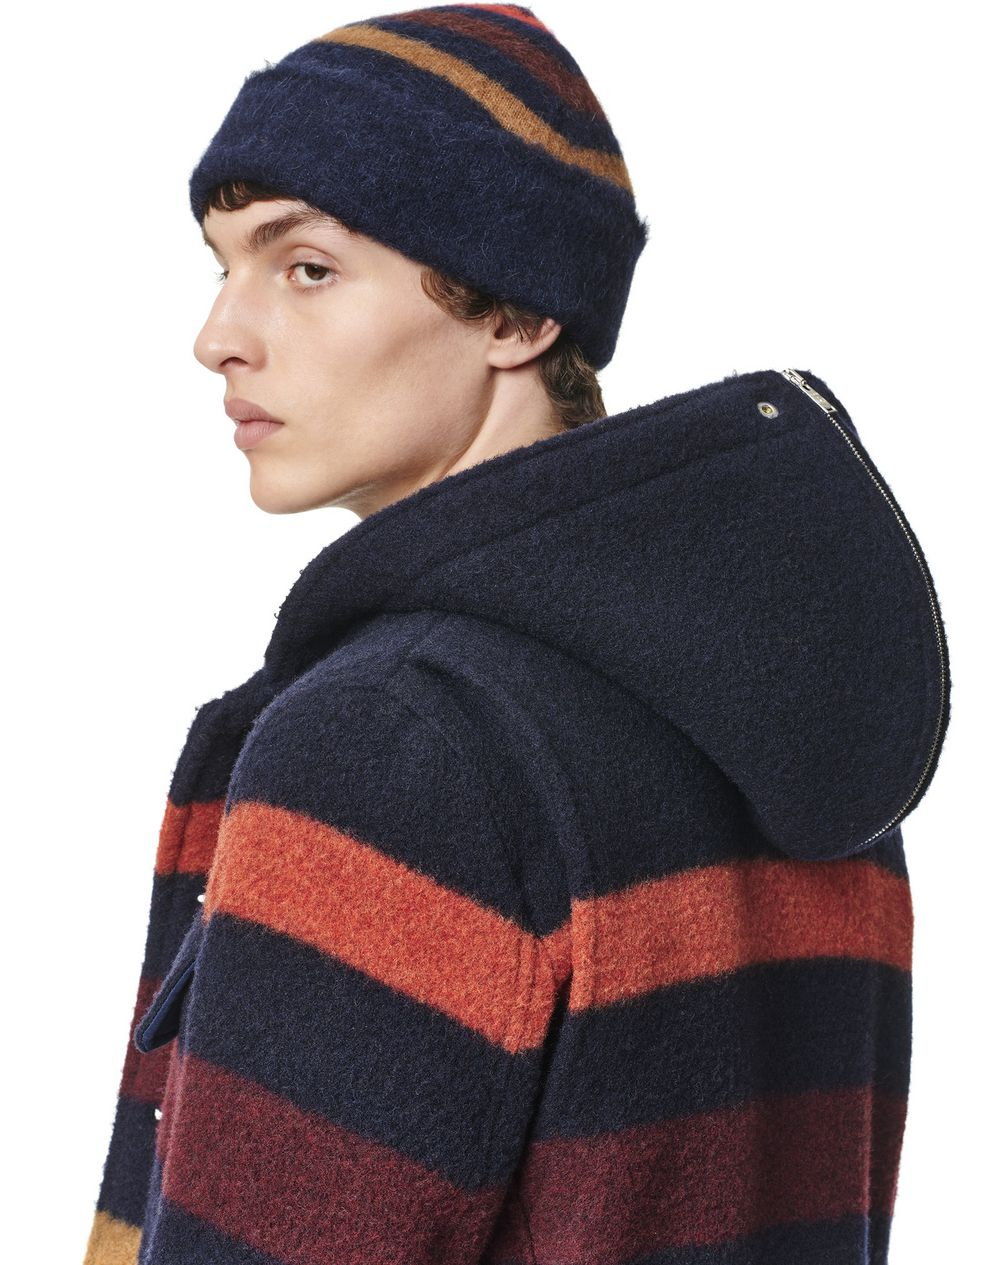 STRIPED HAT IN CASHMERE BLEND - Lanvin